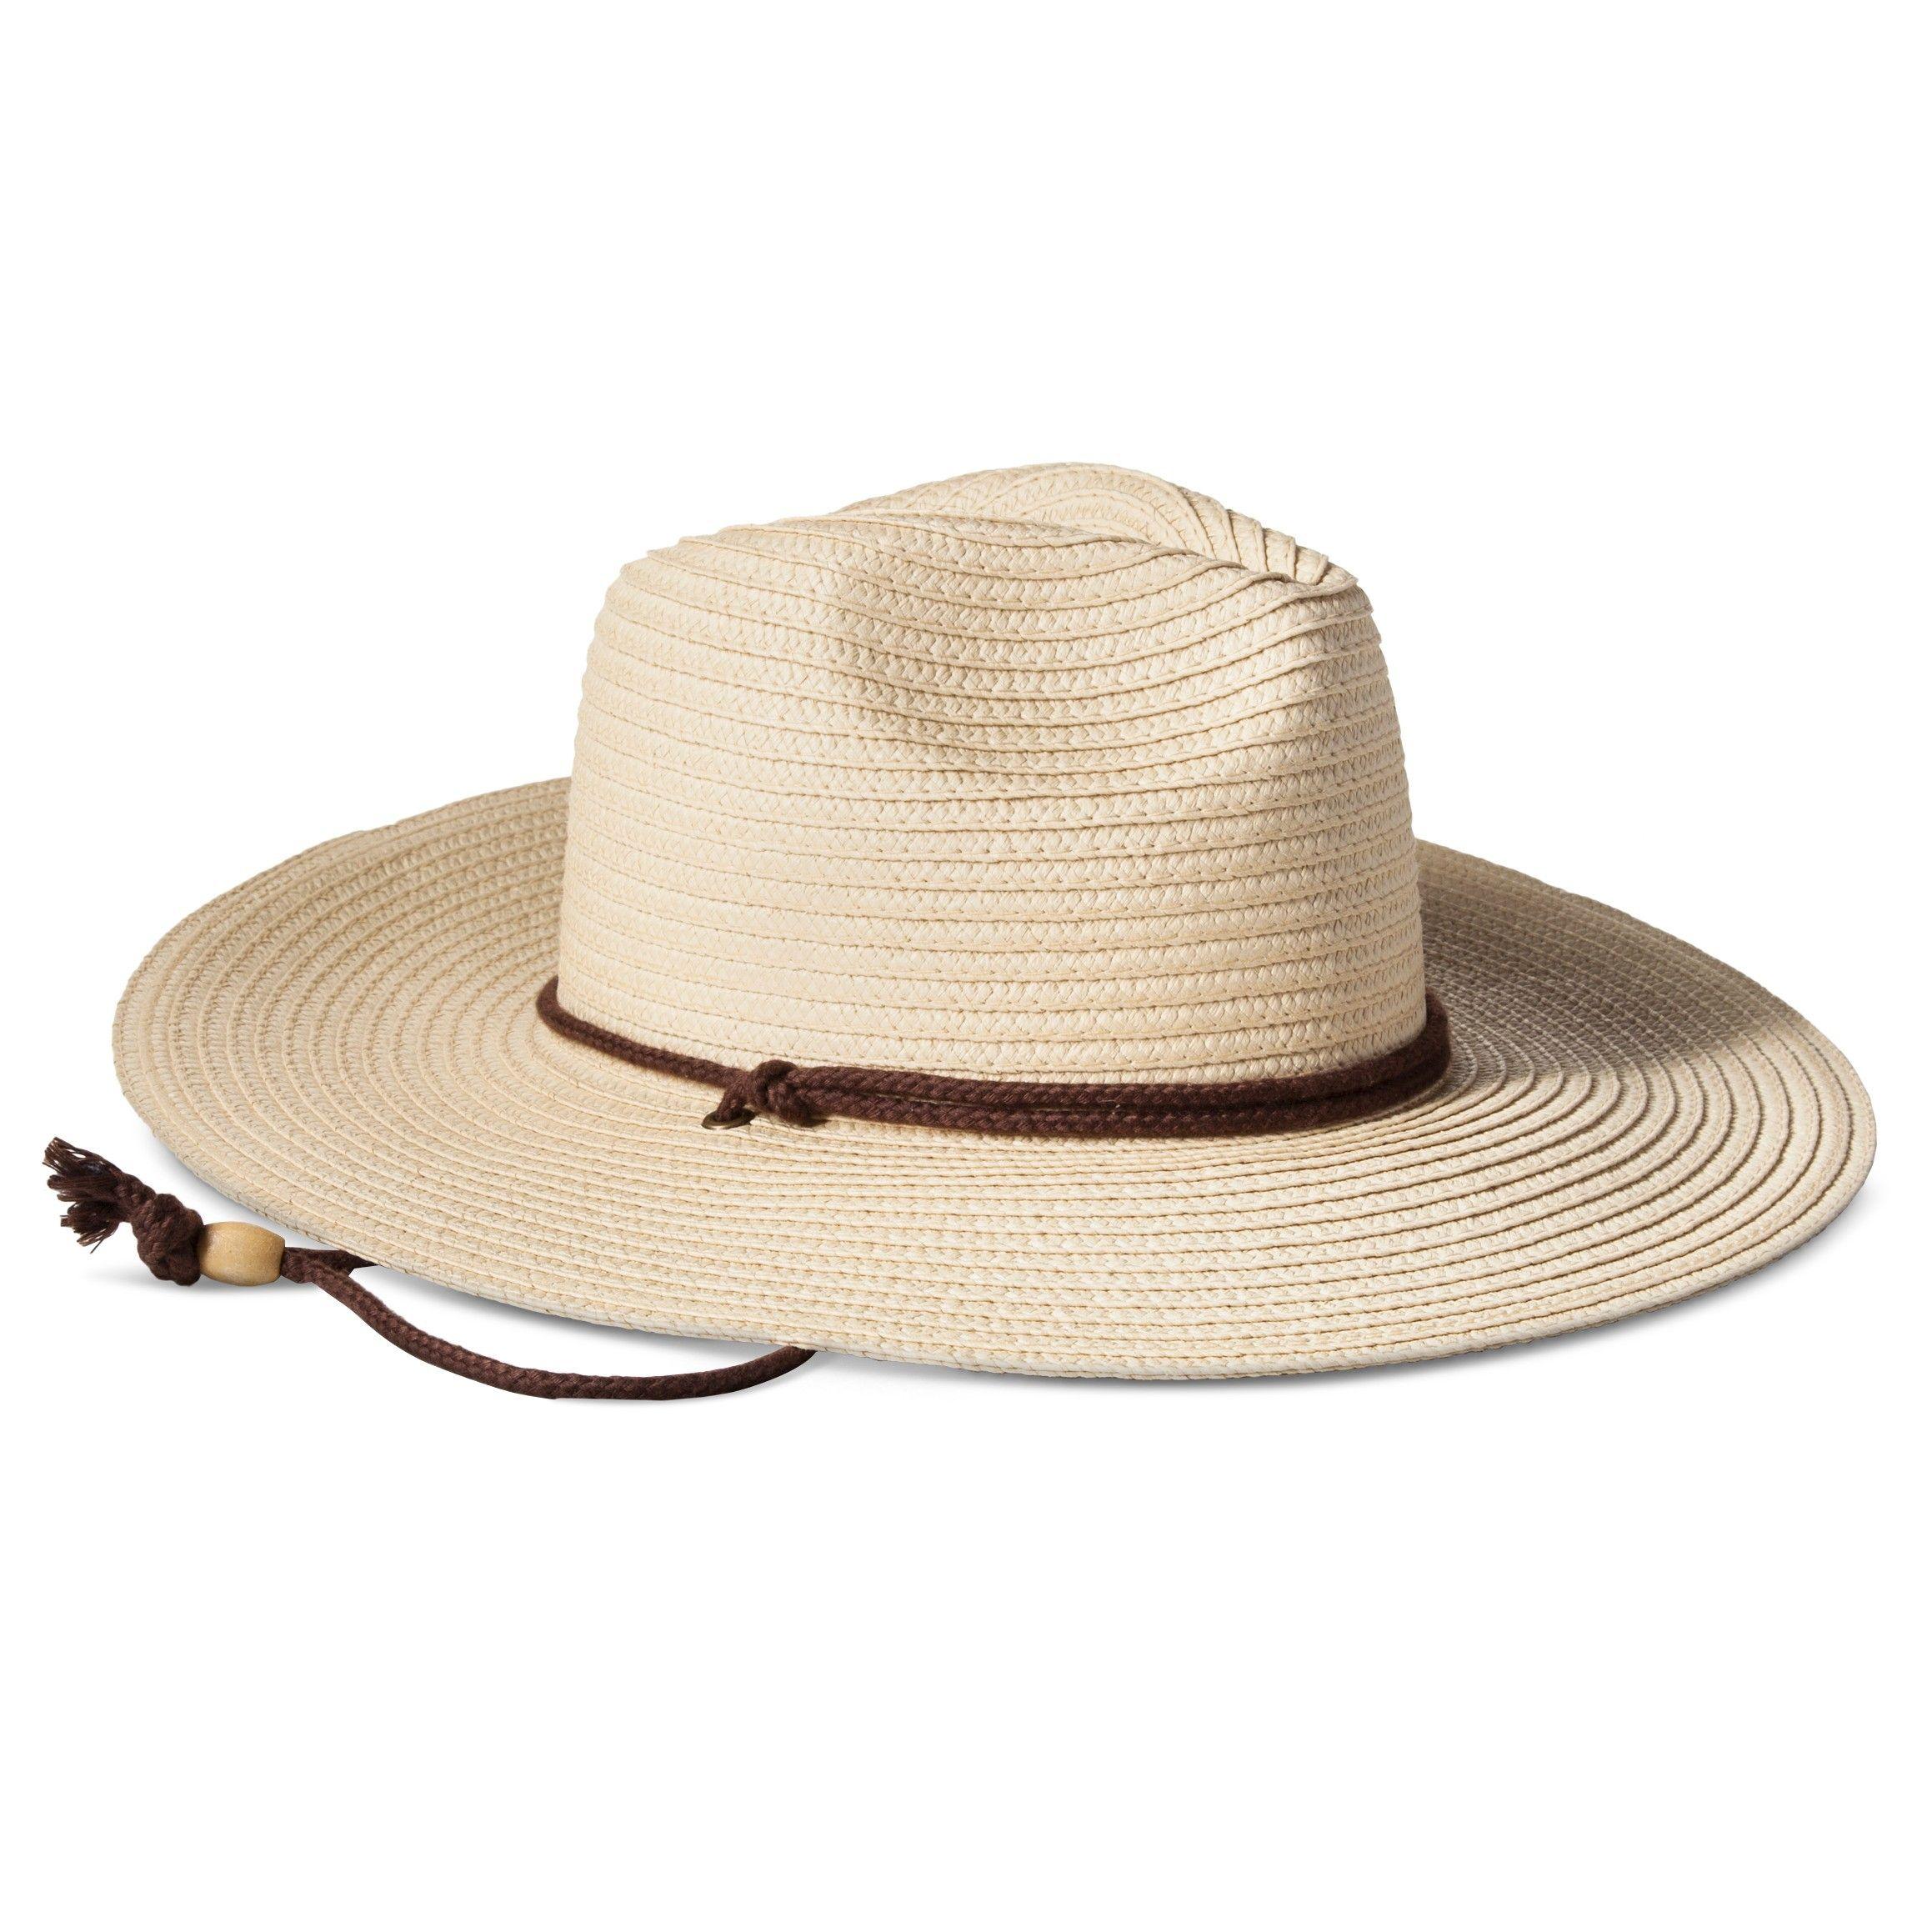 bf5b6bed278 Men s Wide Brim Fedora Desert Tan